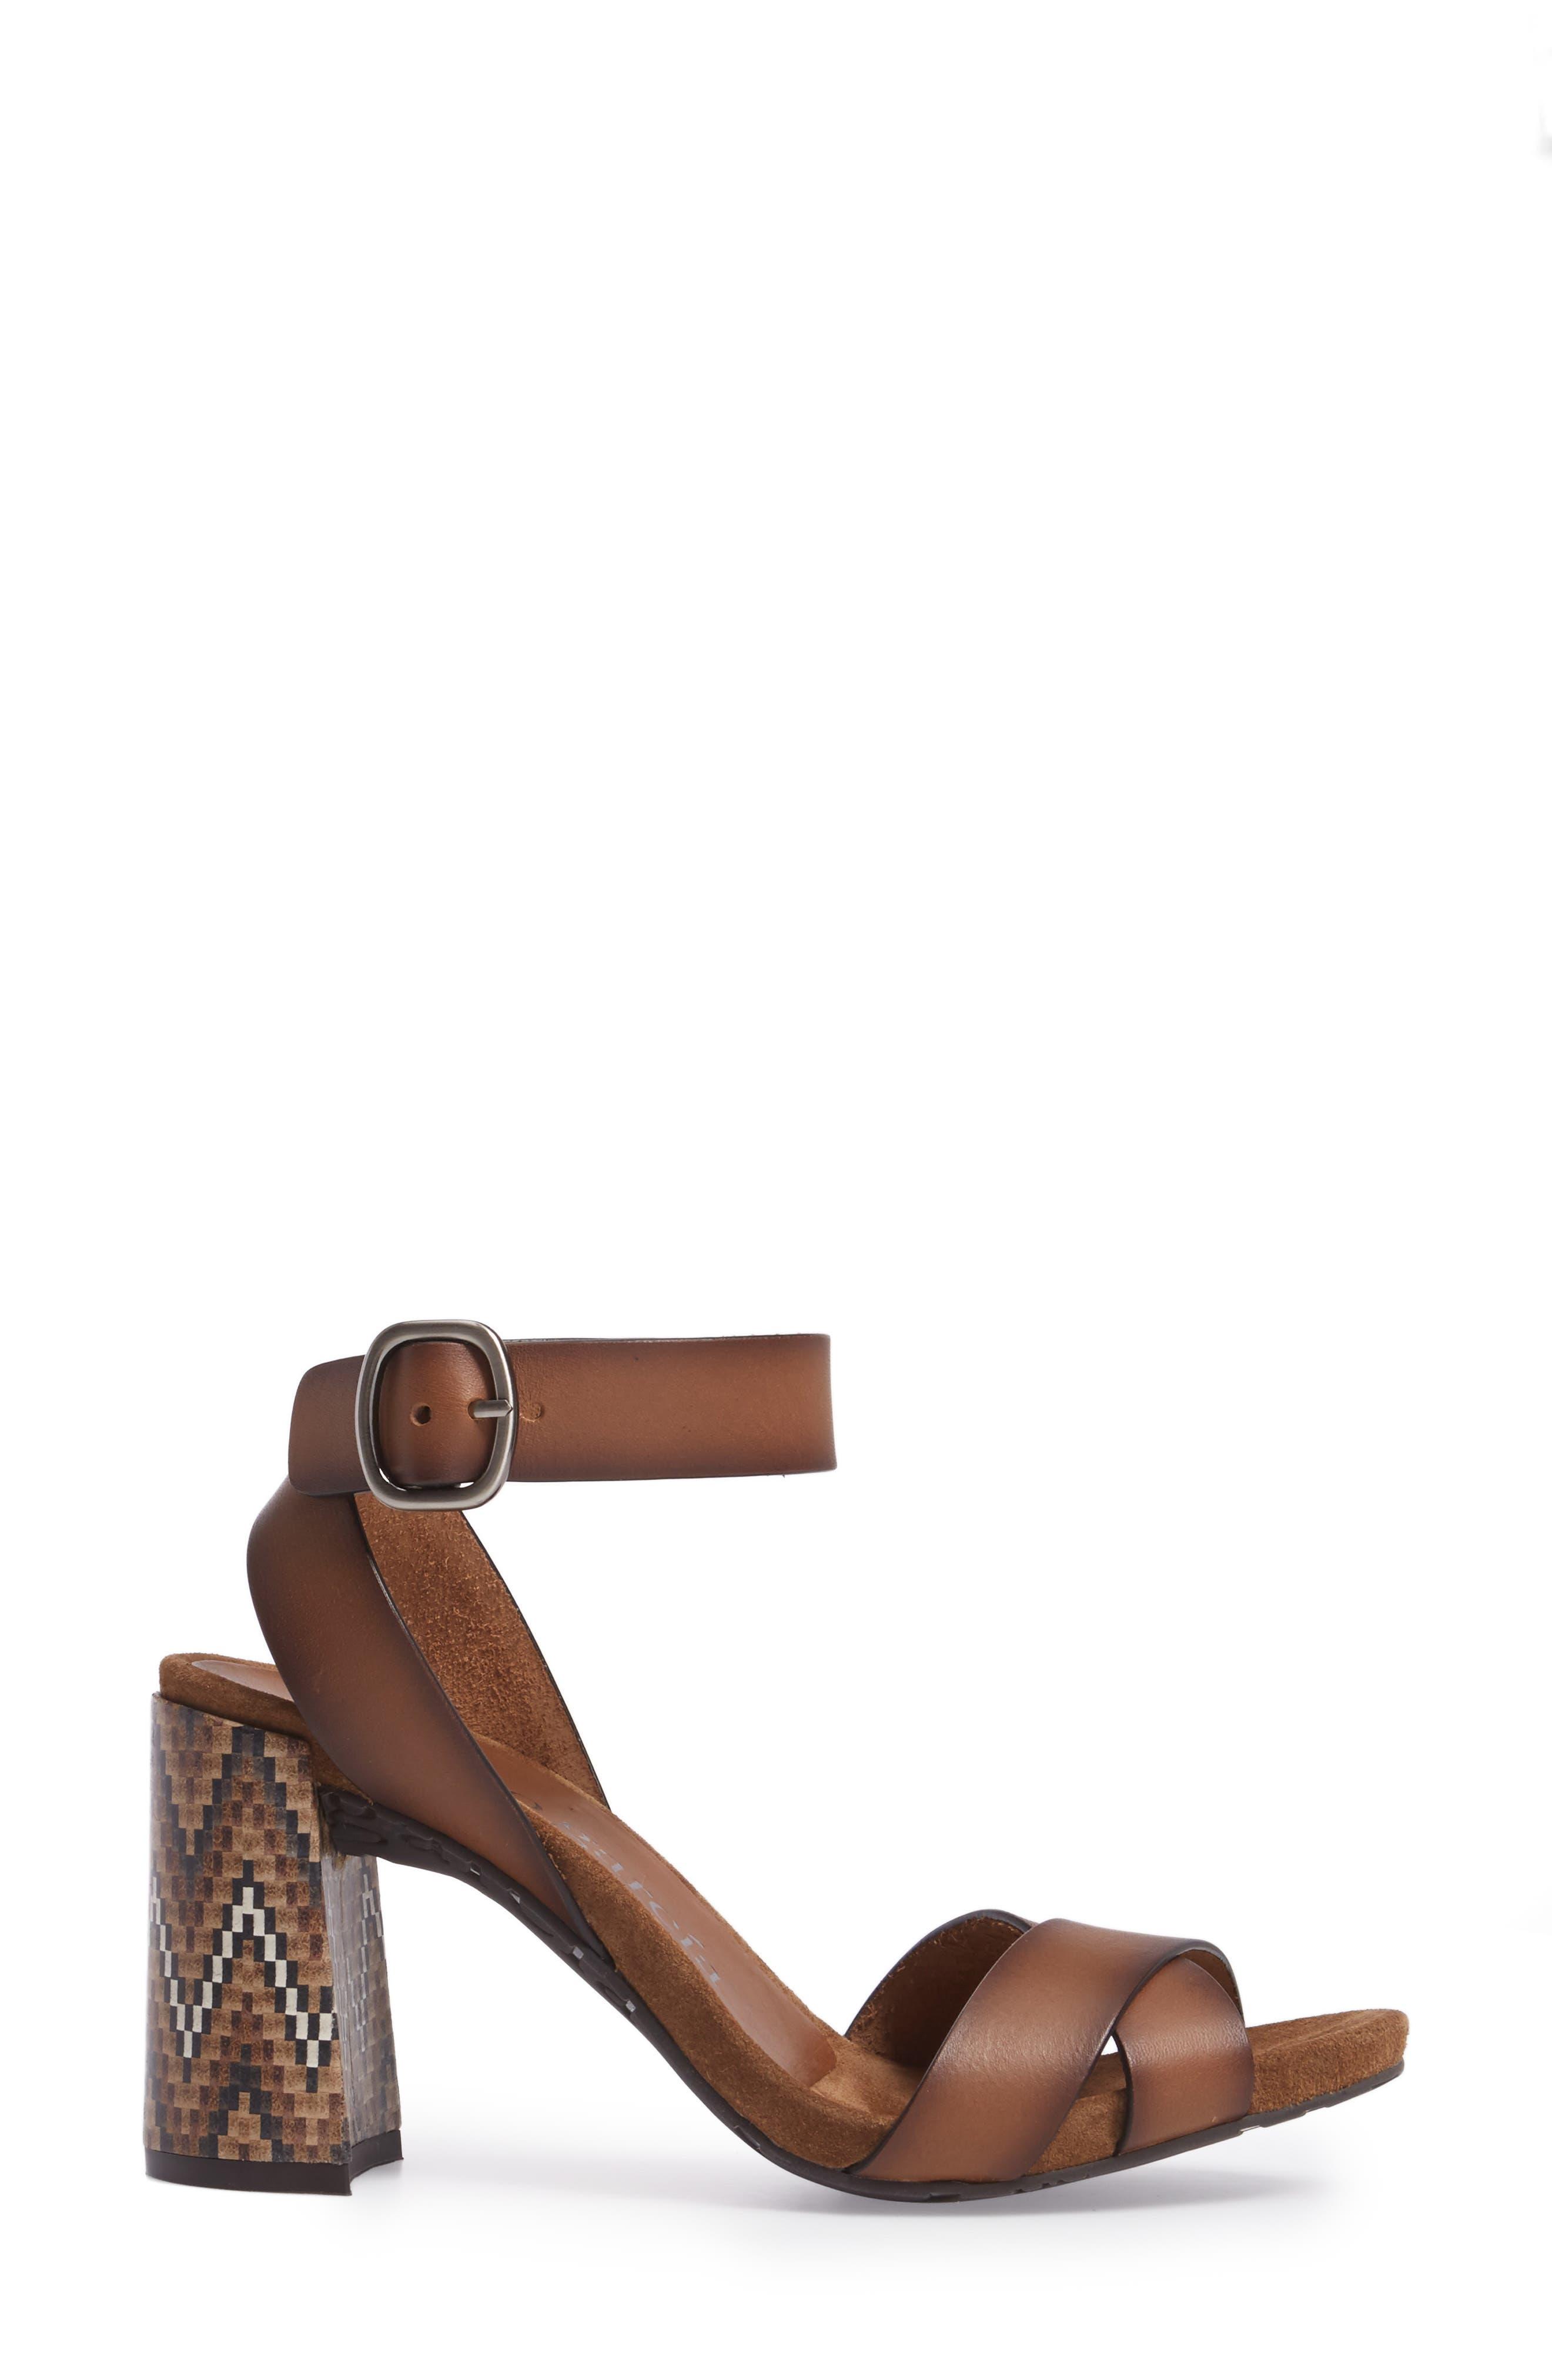 Yemba Embellished Heel Sandal,                             Alternate thumbnail 3, color,                             Cigar Vacchetta